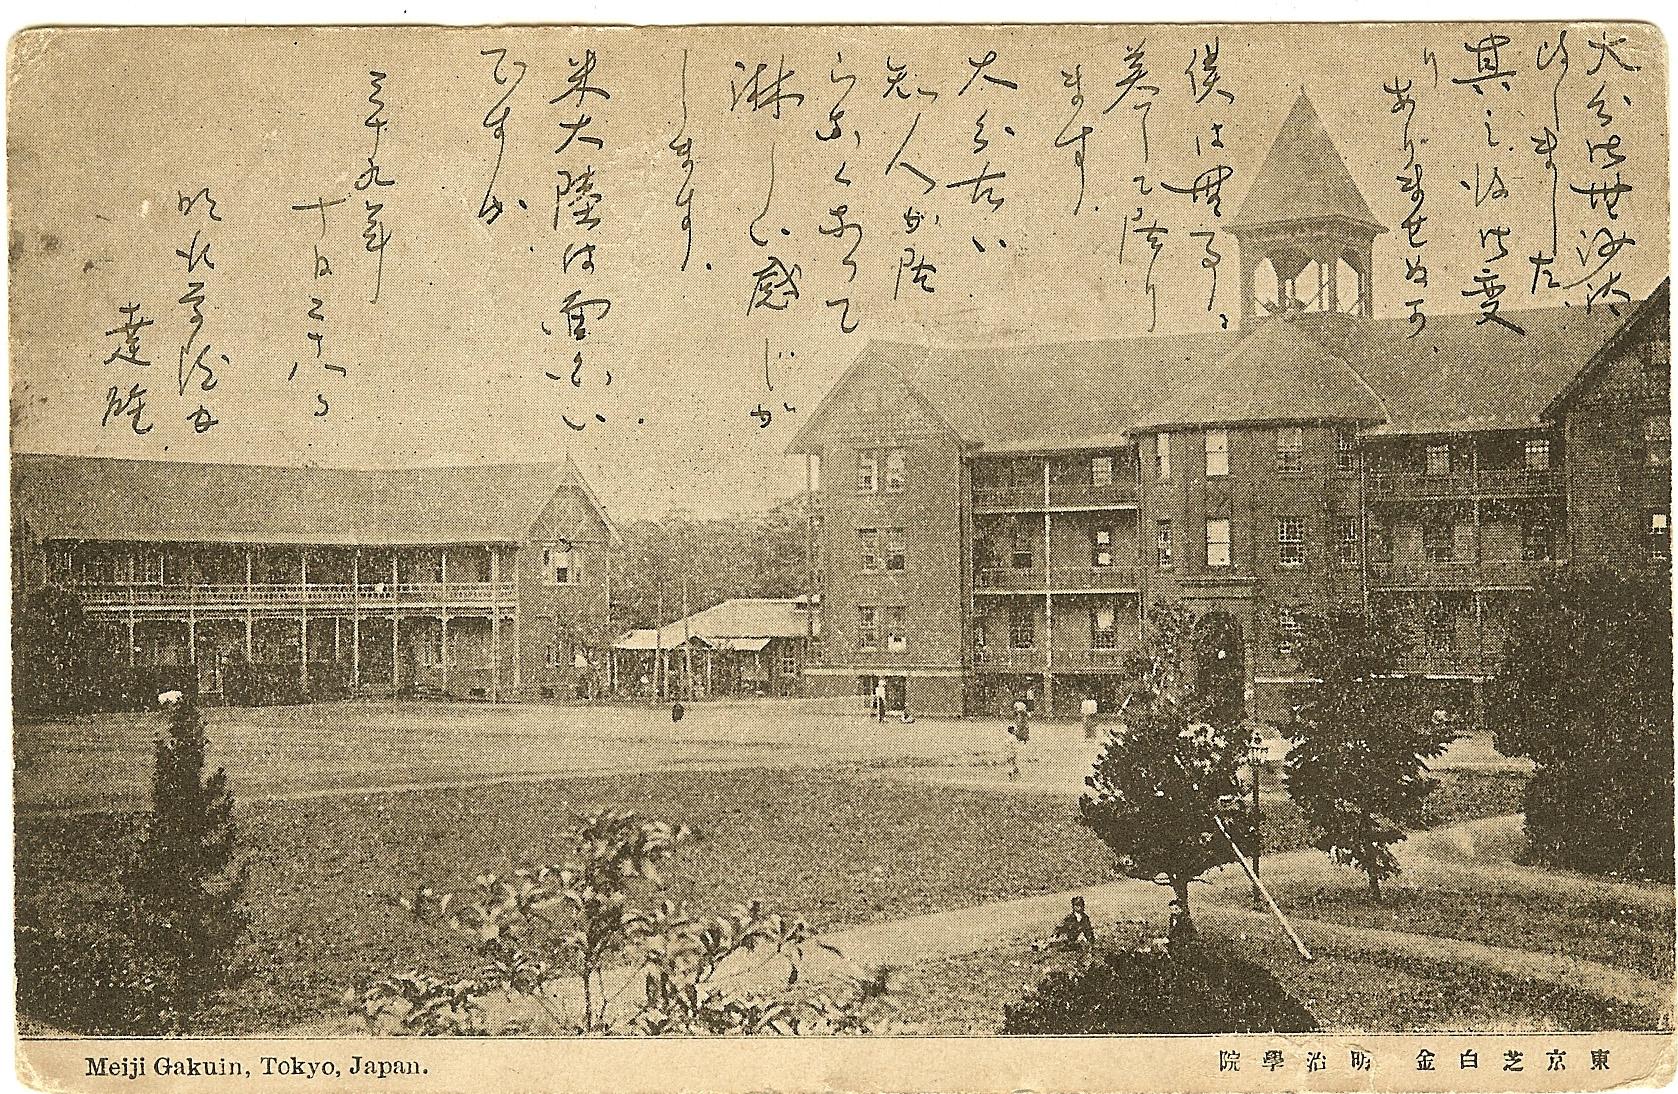 Postcard of Meiji Gakuin University 1905